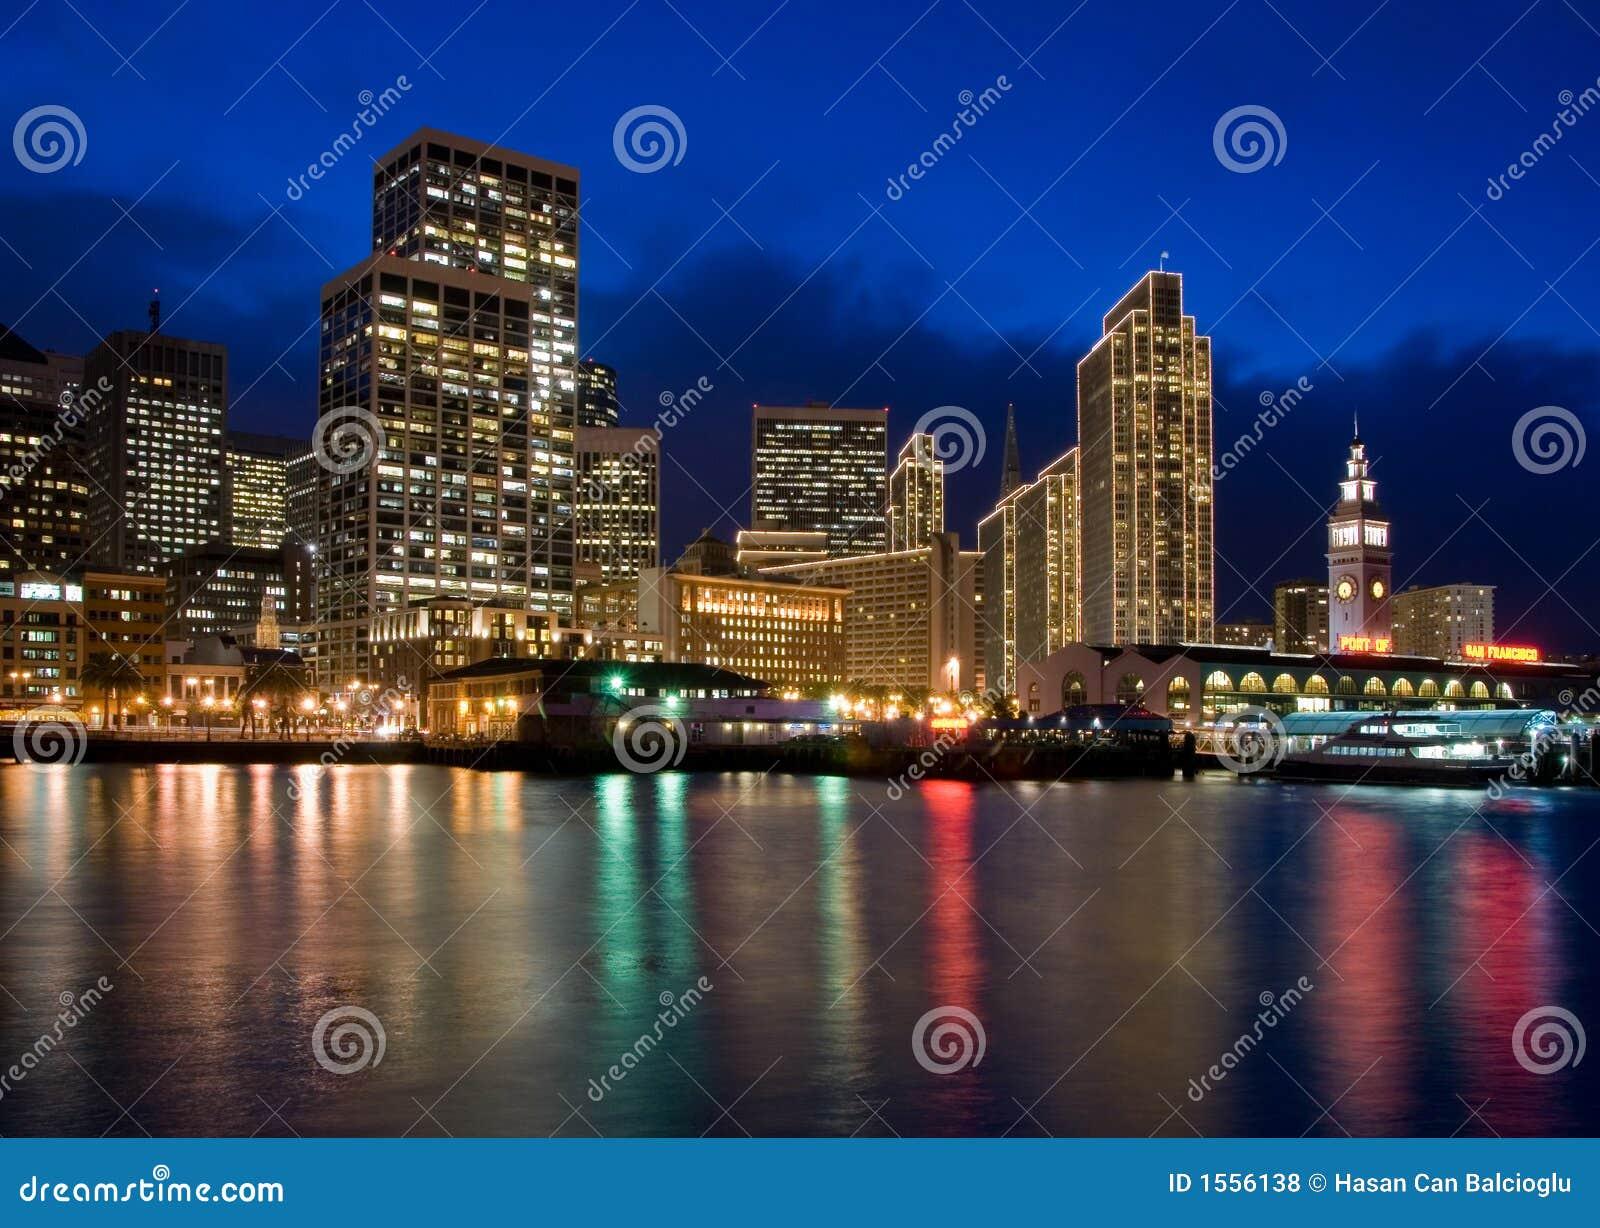 San Francisco Waterfront Night Scene At Christmas